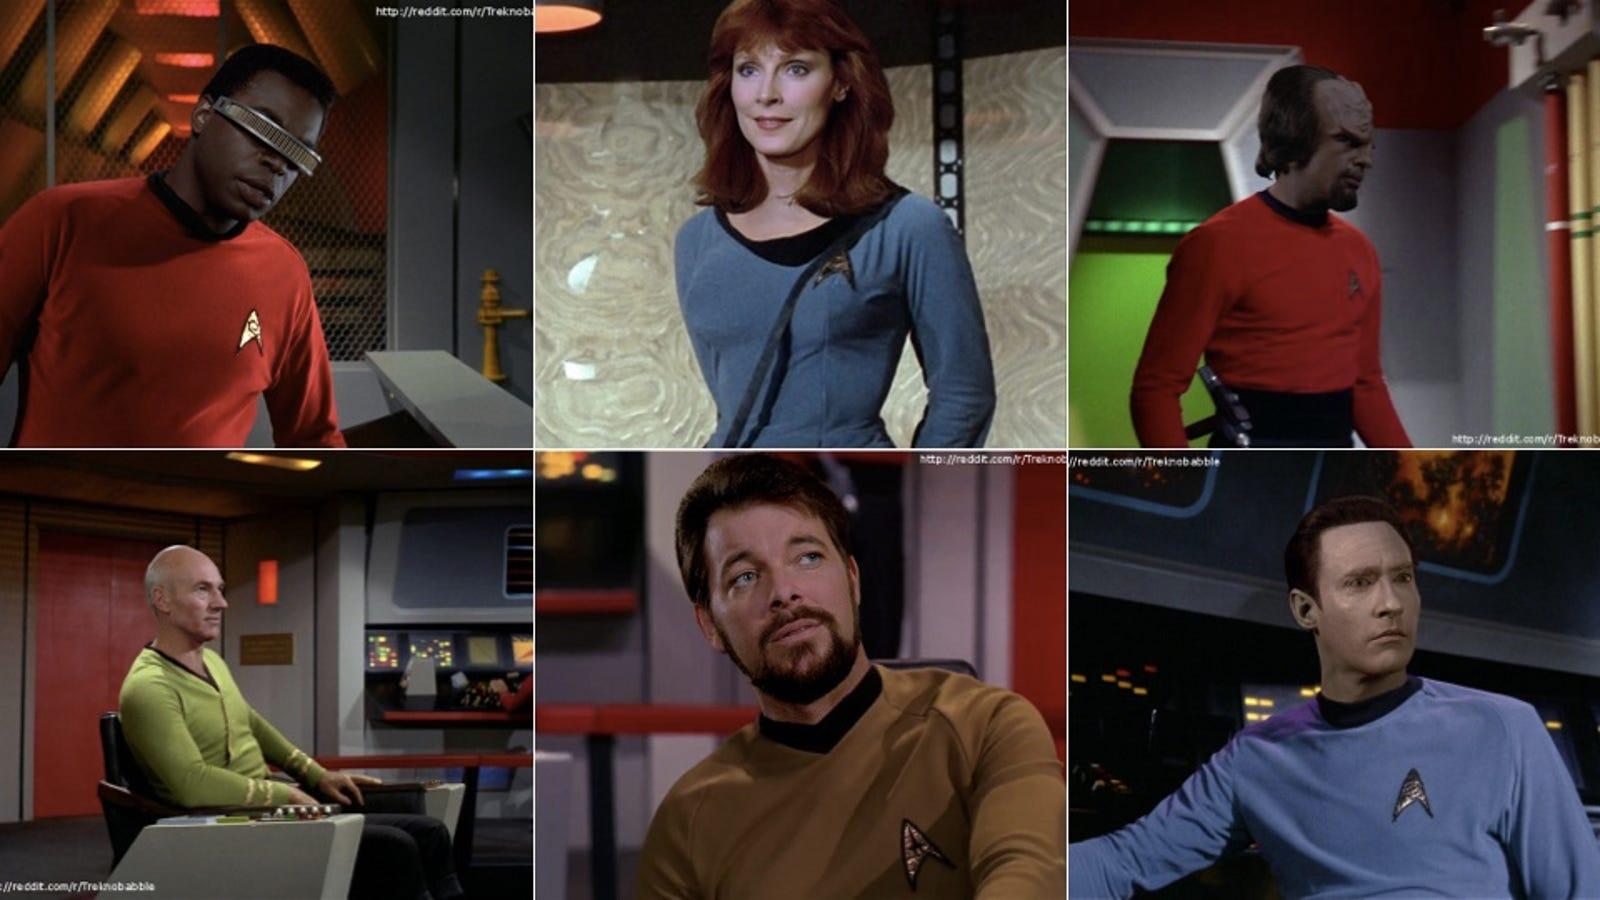 The Star Trek: TNG crew looks amazing in Original Series uniforms